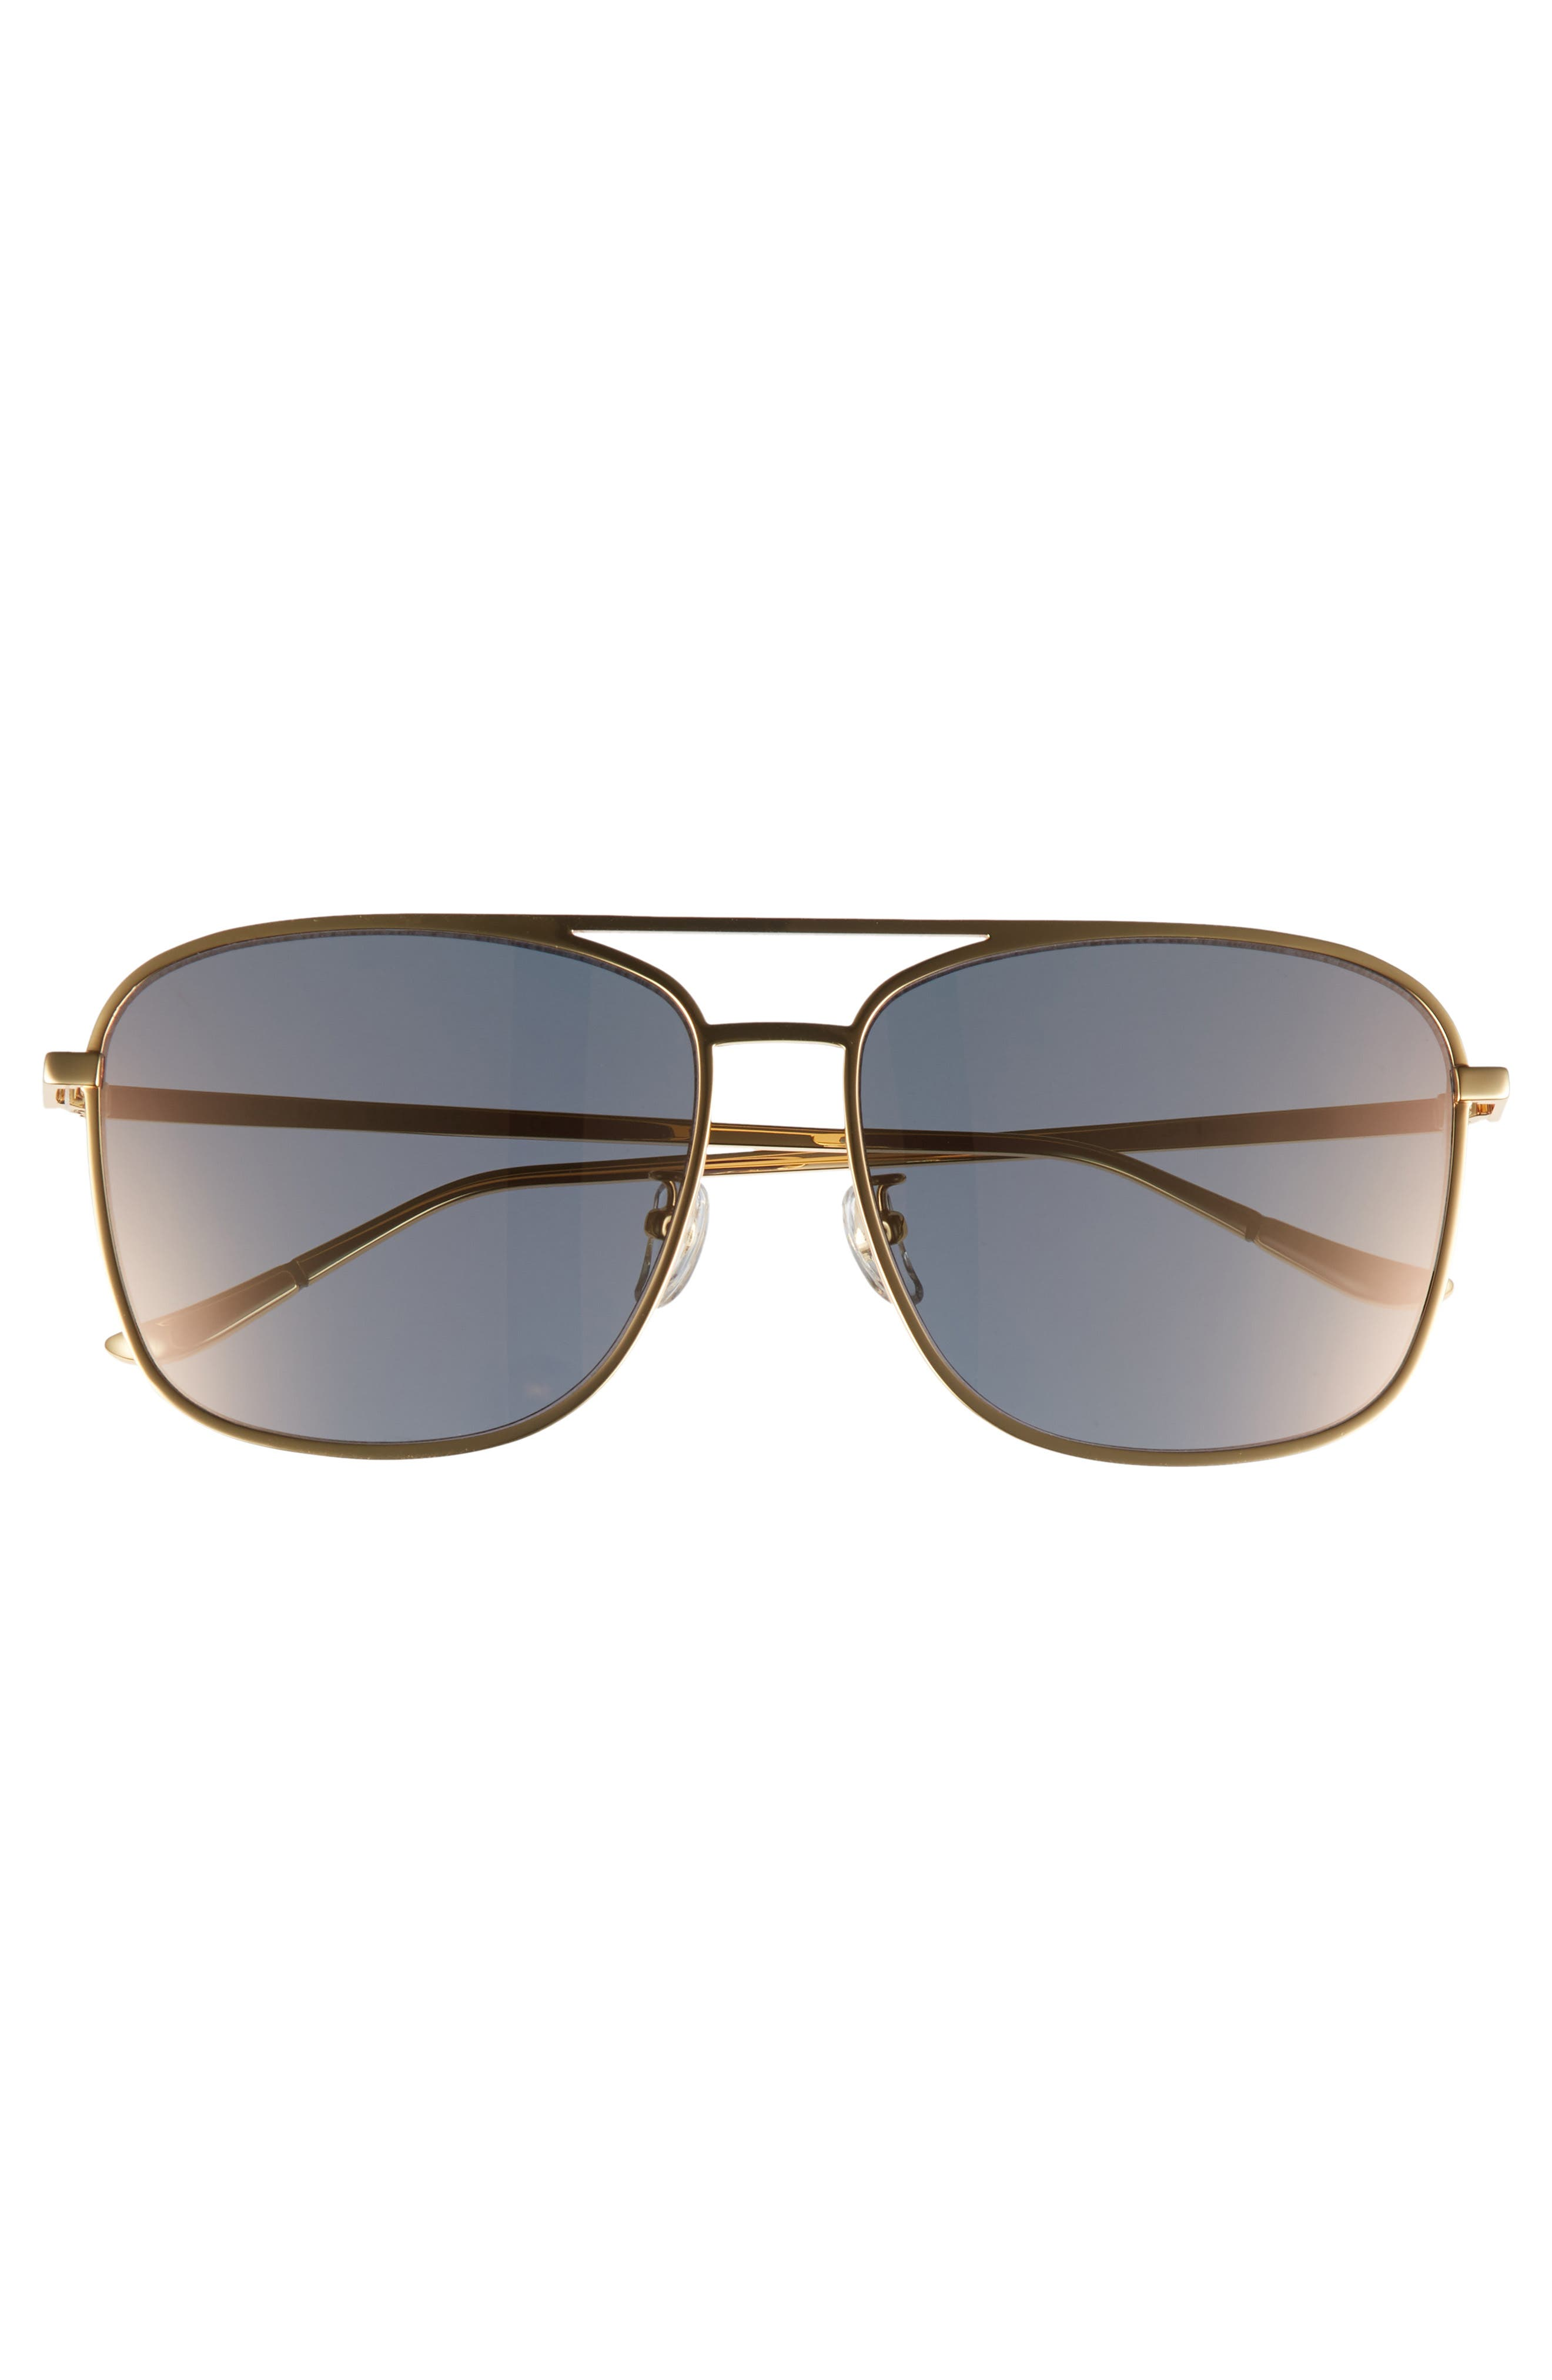 BLANC & ECLARE Geneva 61mm Large Polarized Metal Aviator Sunglasses,                             Alternate thumbnail 3, color,                             Gold/ Pink